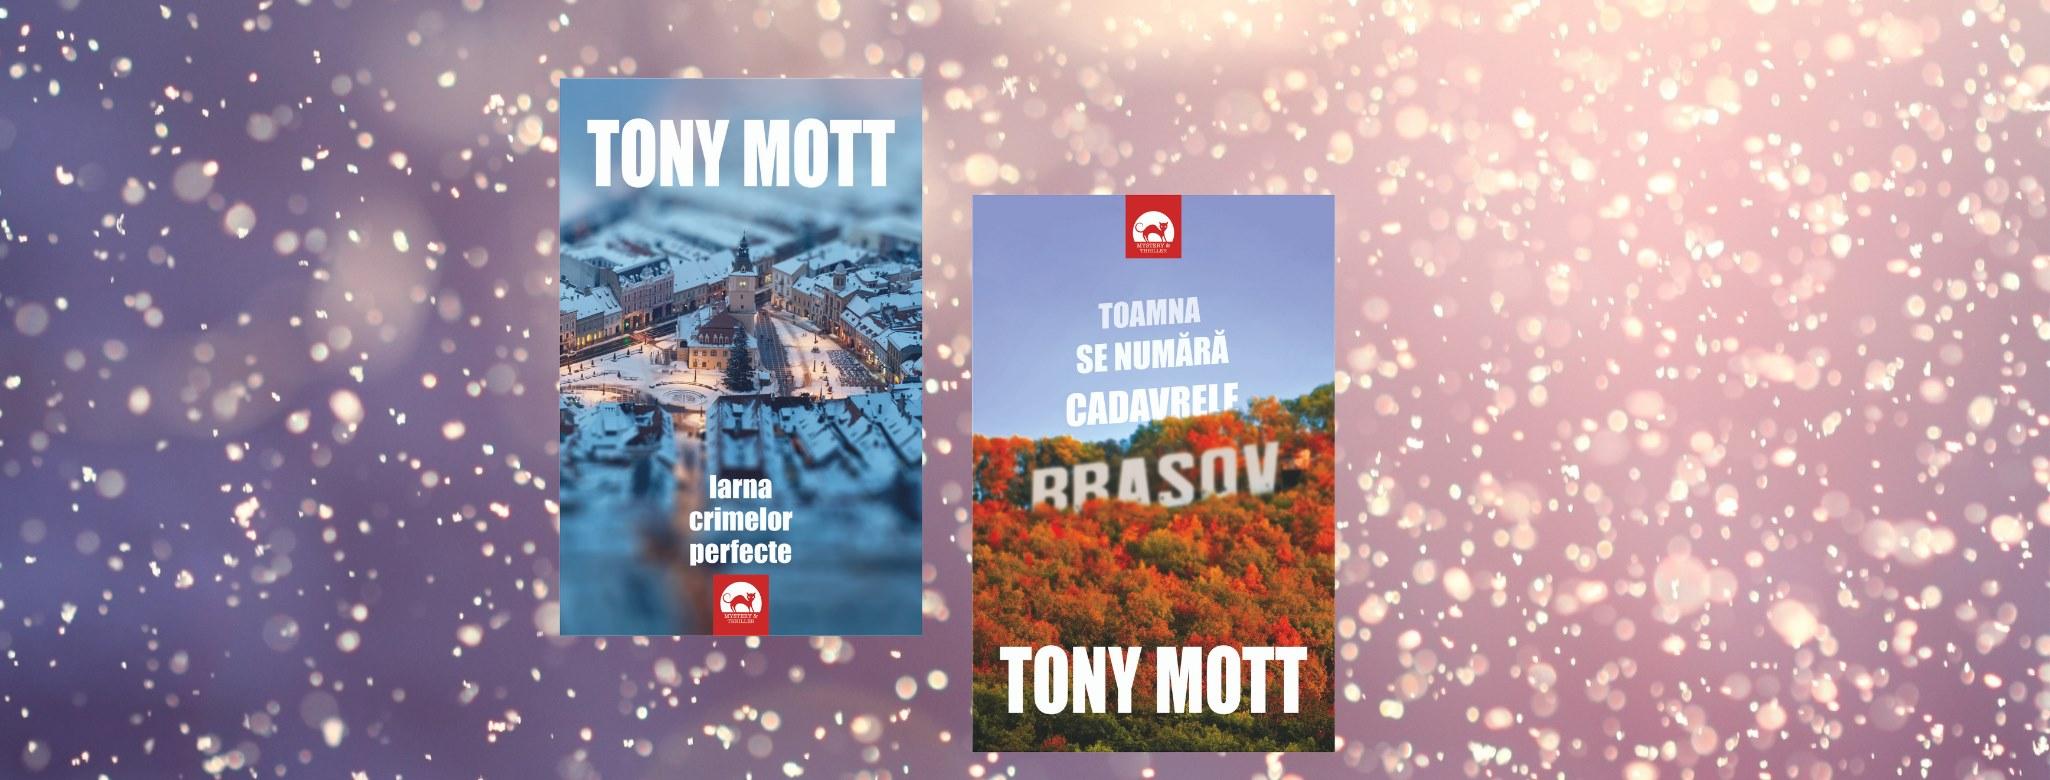 Toamna se numara cadavrele – Tony Mott (Antoaneta Gales)